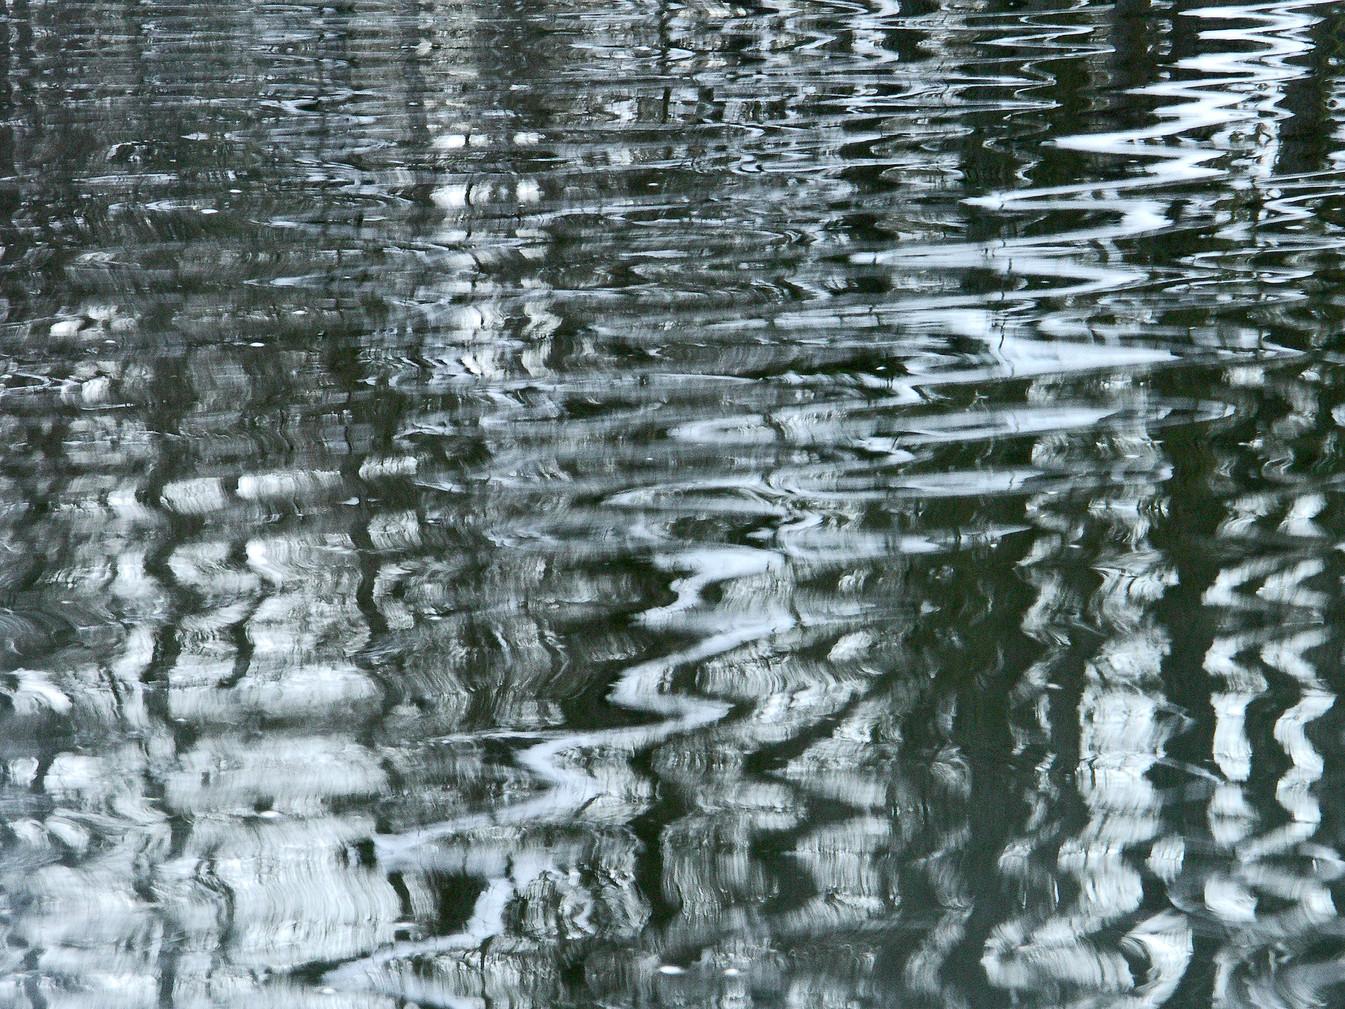 16_Vom Wasser - Waldnaab, 2006, Fotograf